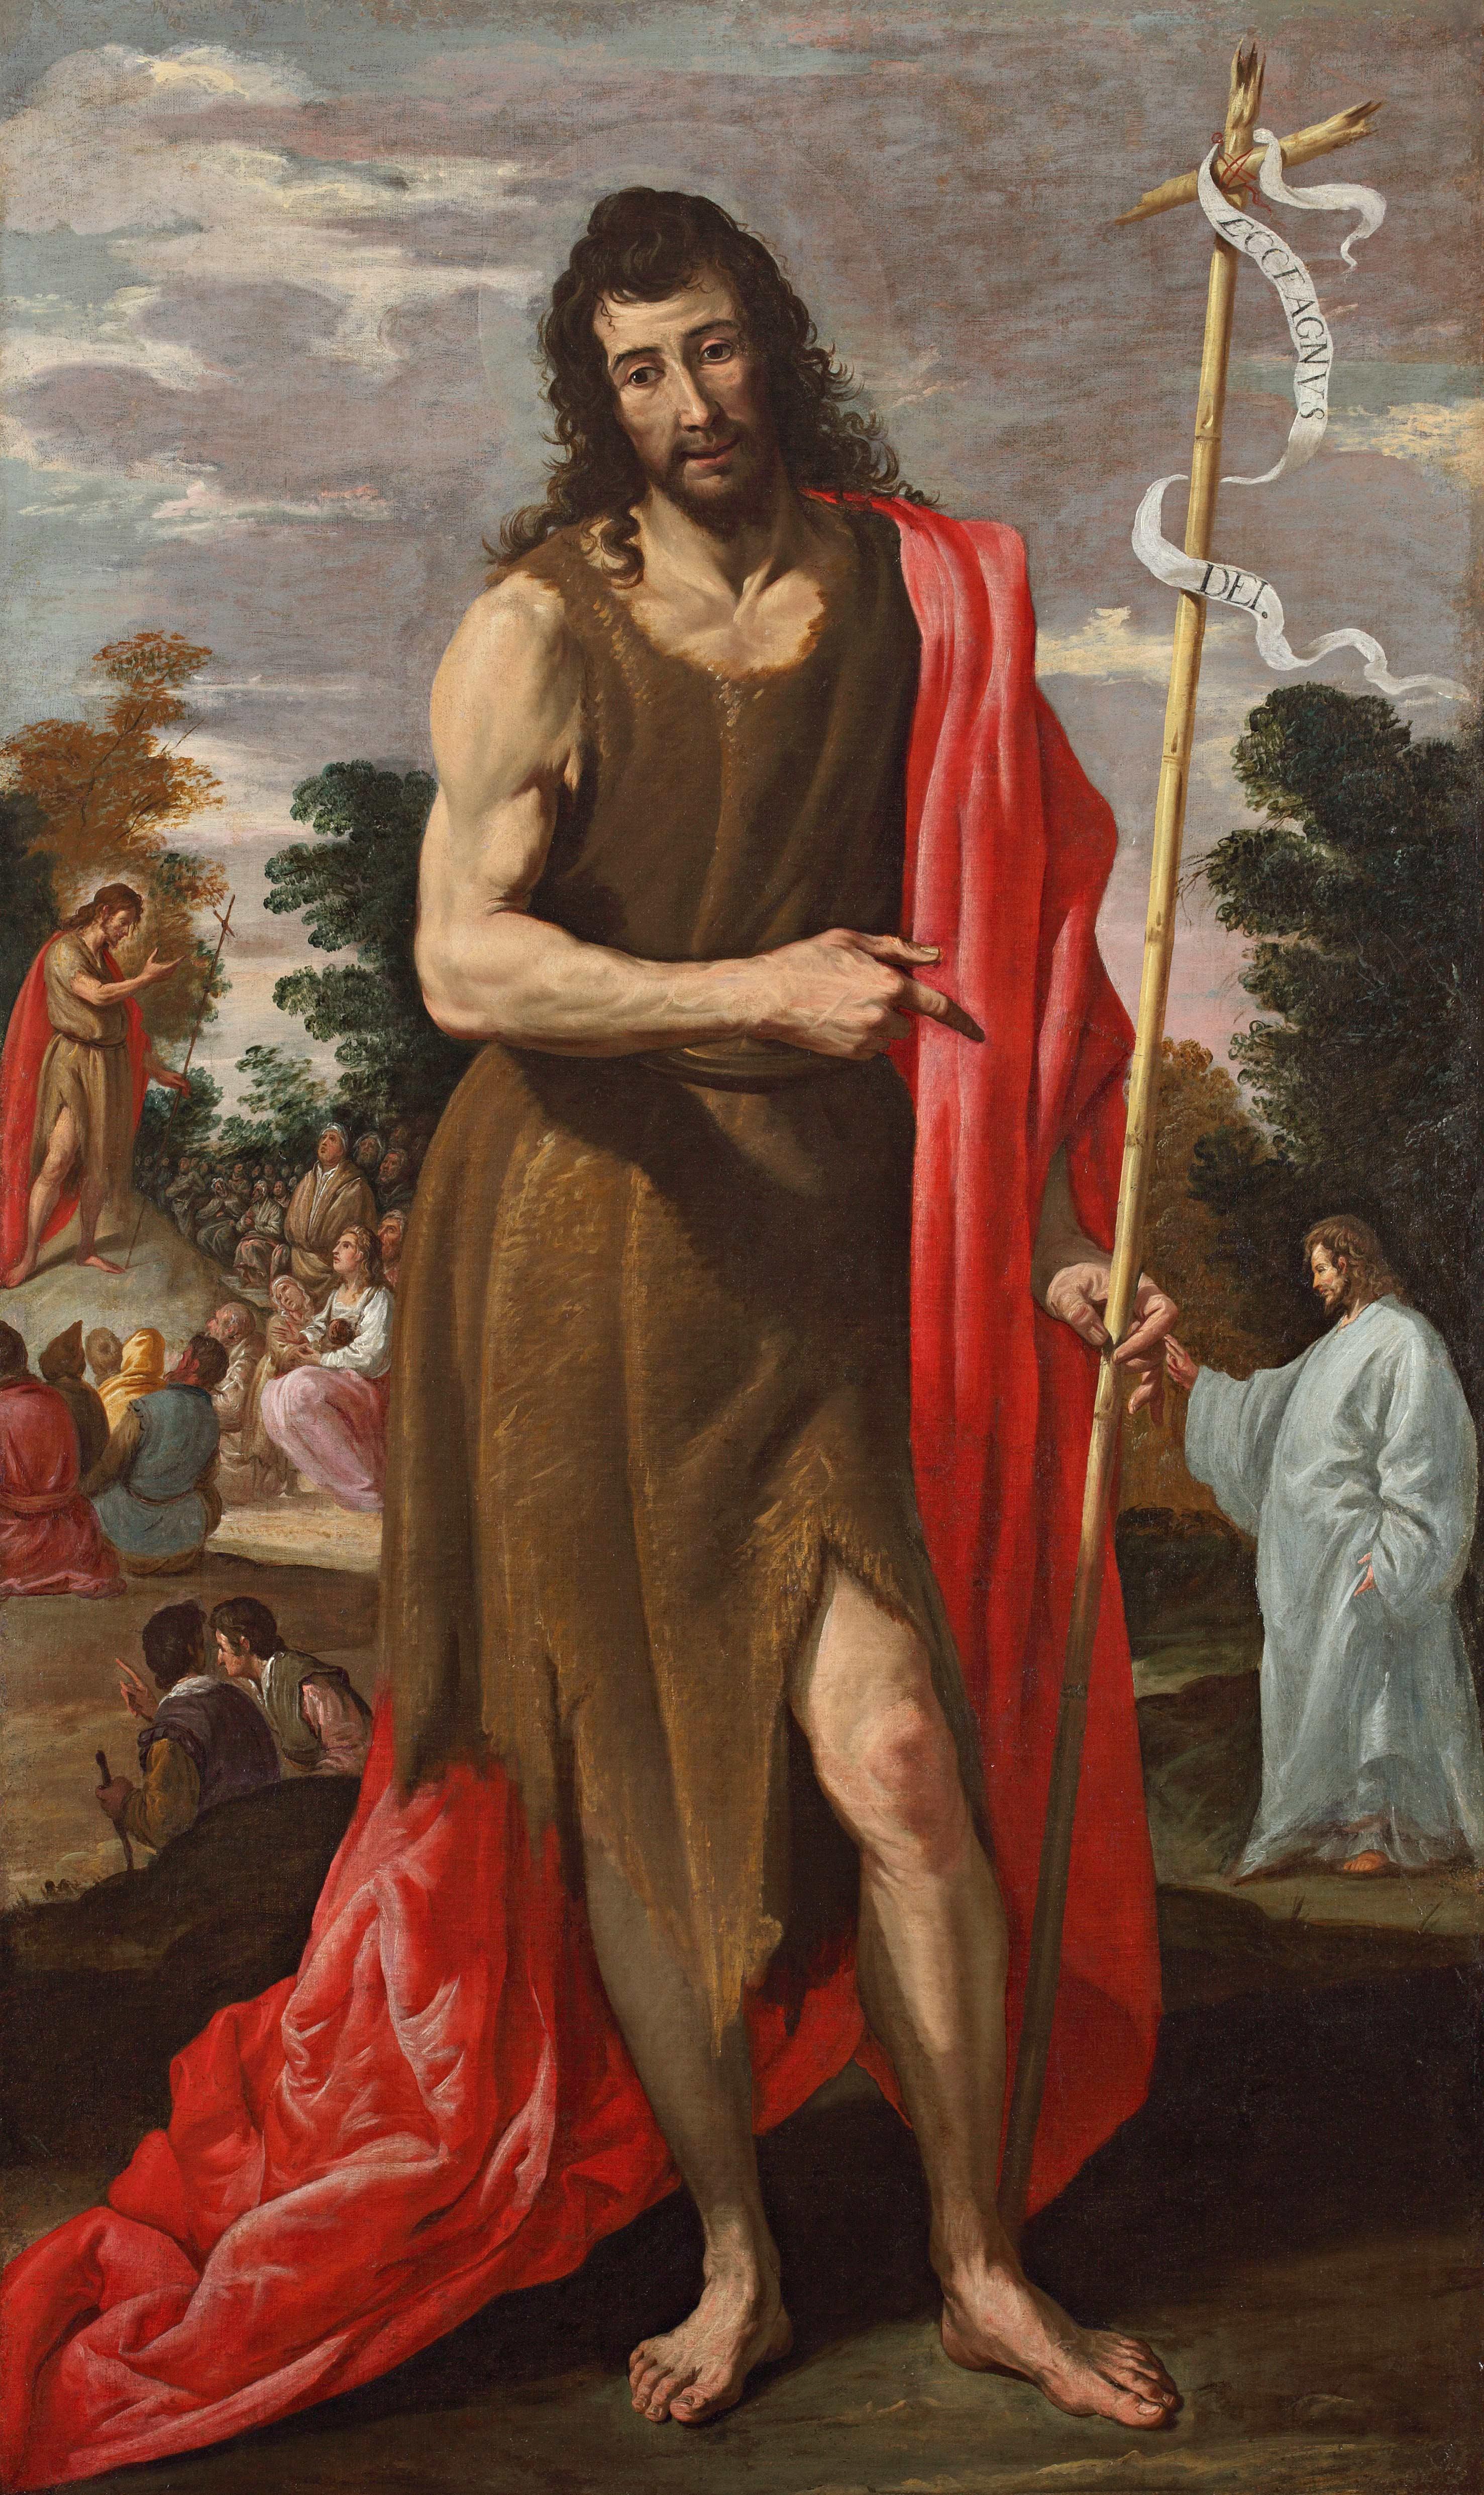 Jusepe Leonardo, Saint Jean-Baptiste, vers 1635-1640, galerie Terrades